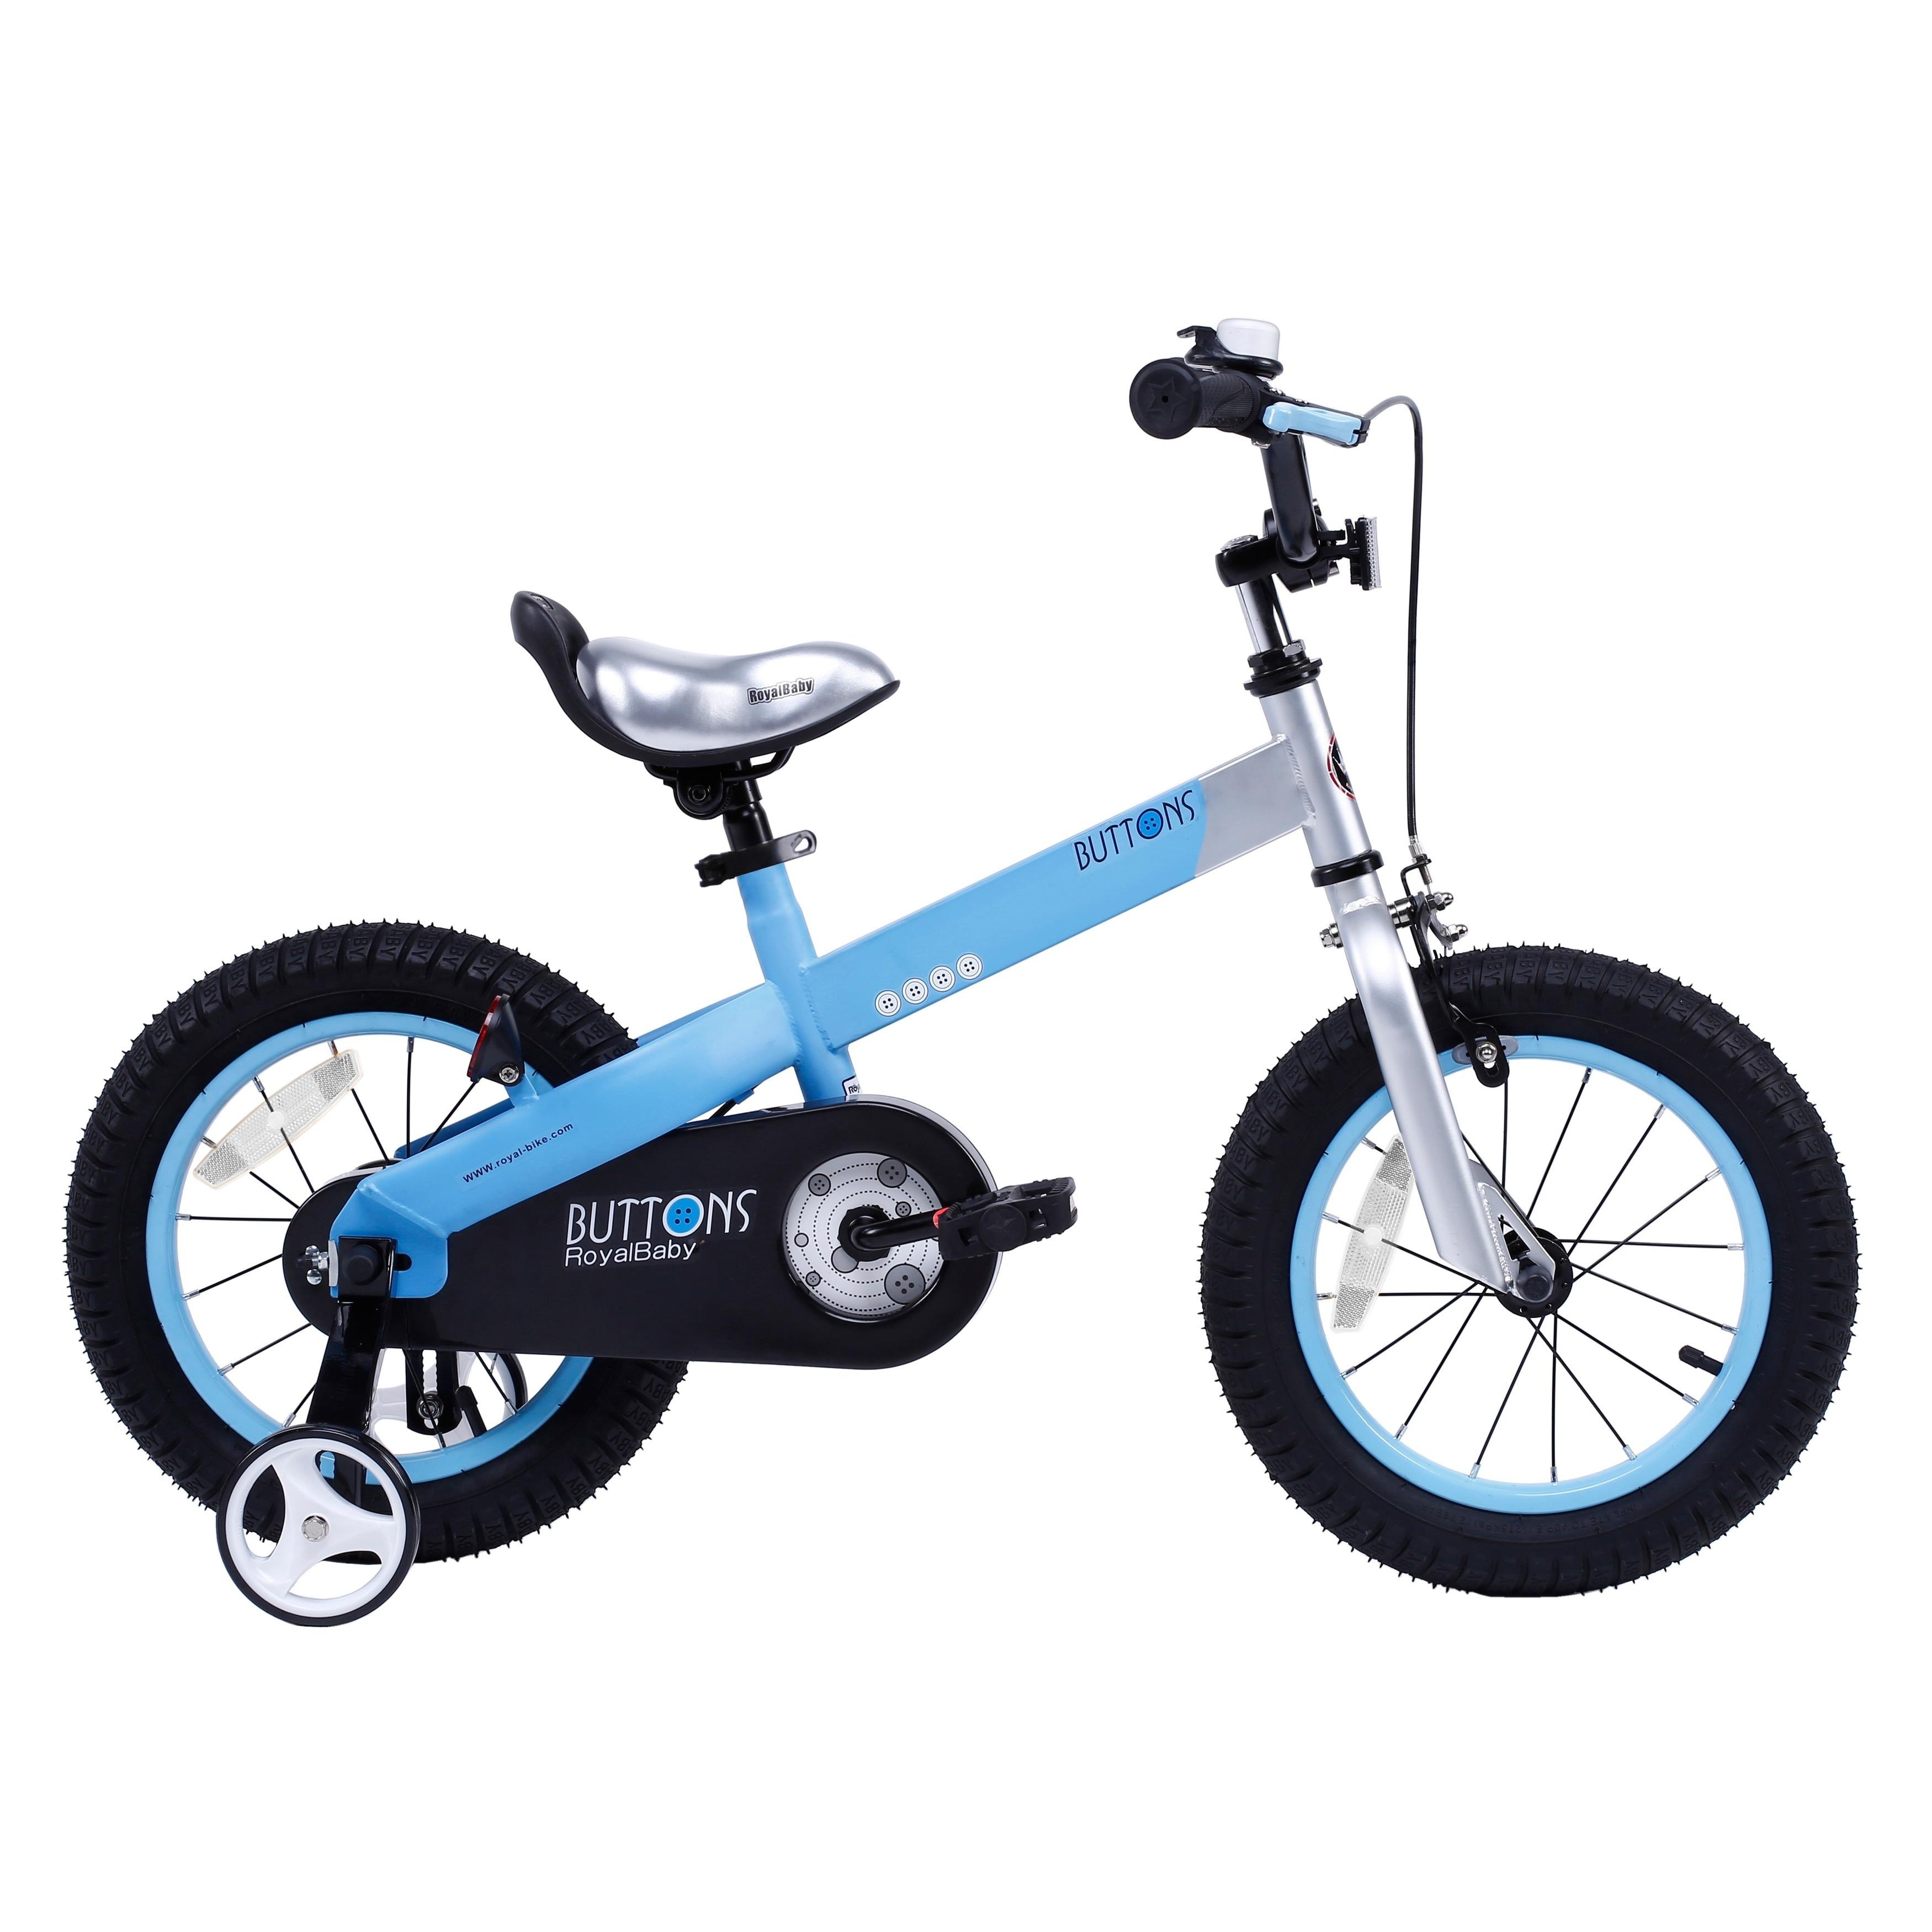 Shop Royalbaby Matte Buttons 14-inch Kids' Bike with Training Wheels ... royalbaby bike 14